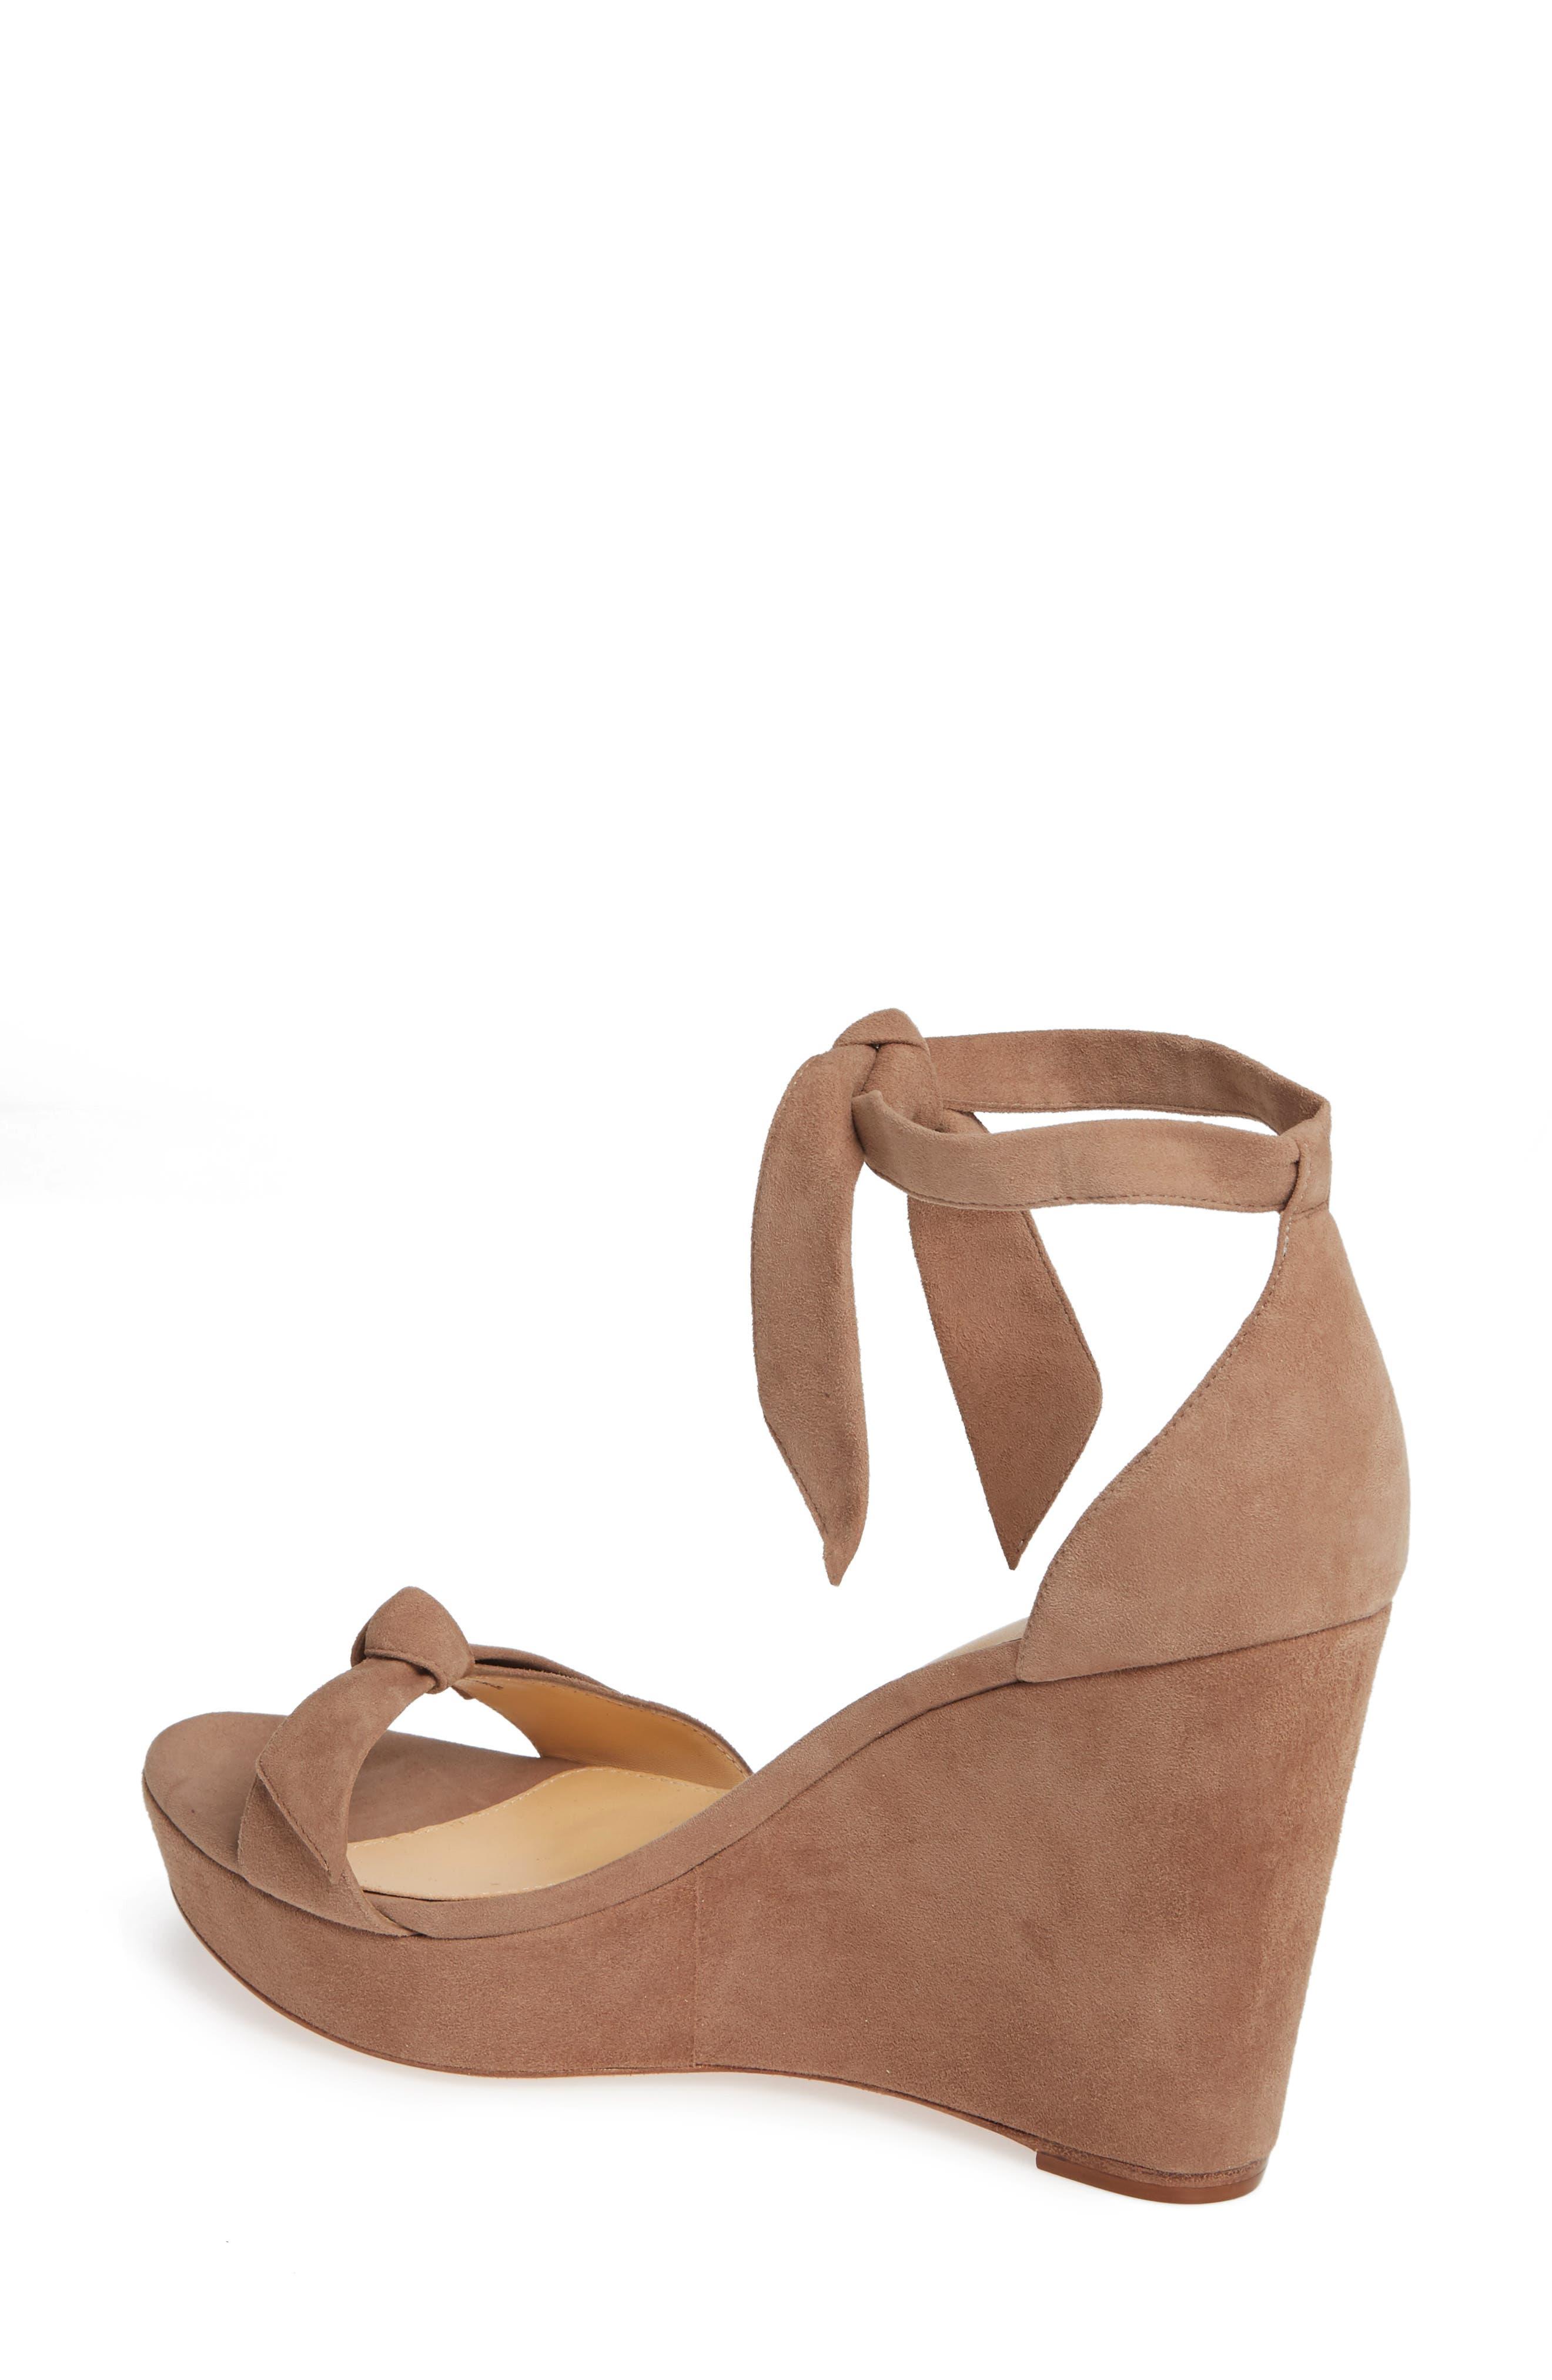 Clarita Platform Wedge Sandal,                             Alternate thumbnail 2, color,                             CAMEO SUEDE